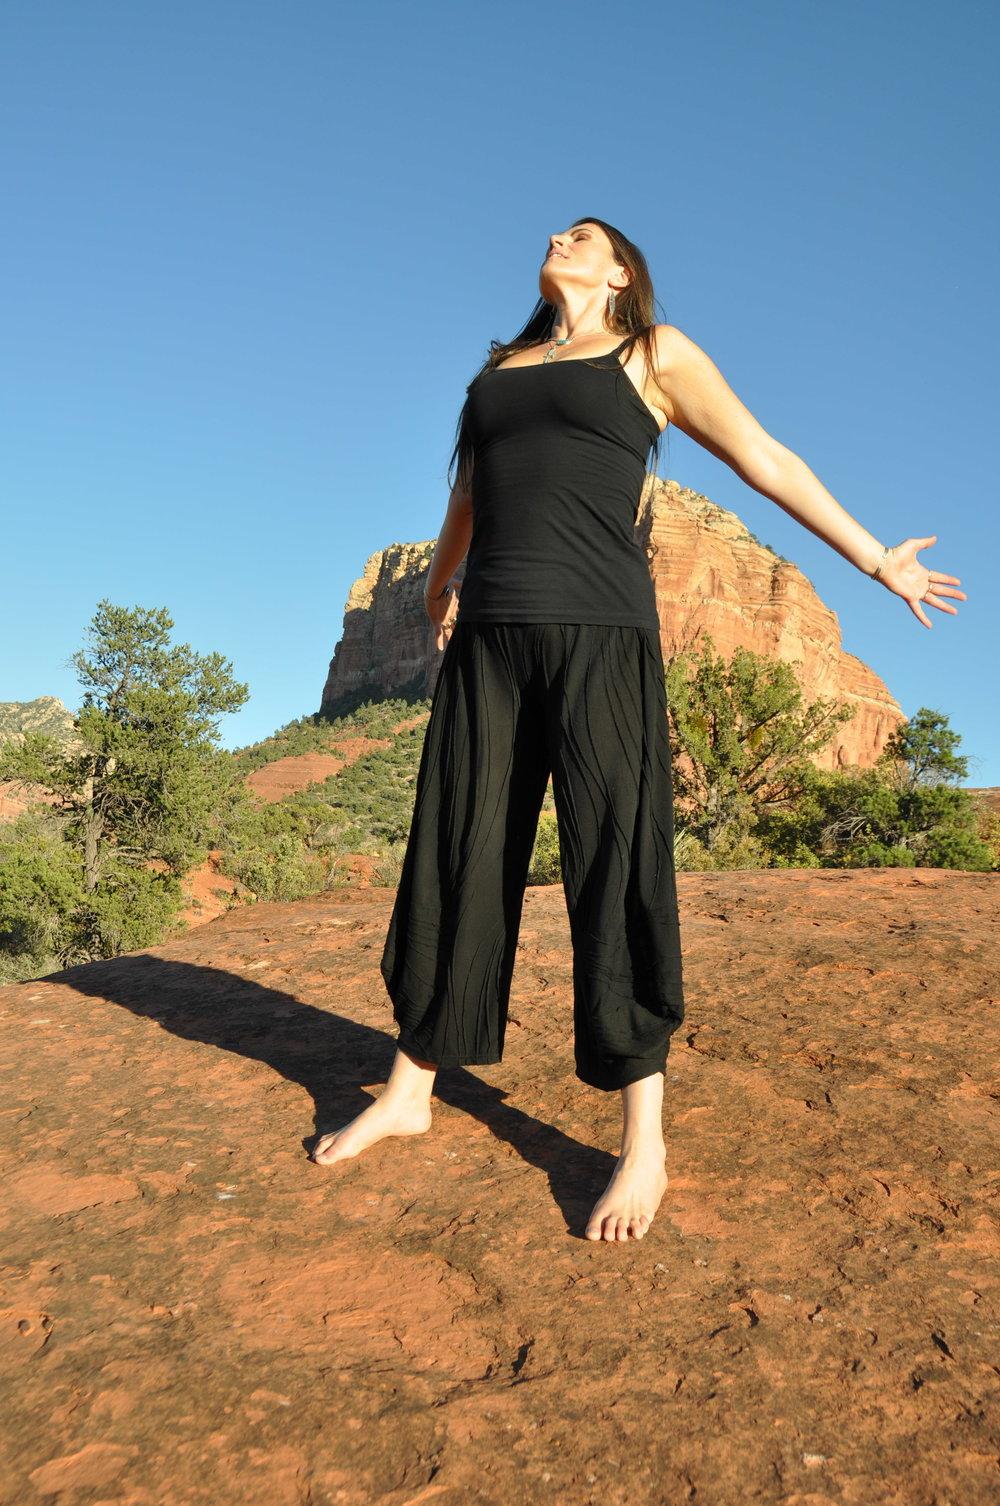 Michelle Hawk Shaman Portland Sedona Reiki Master Healer Teacher